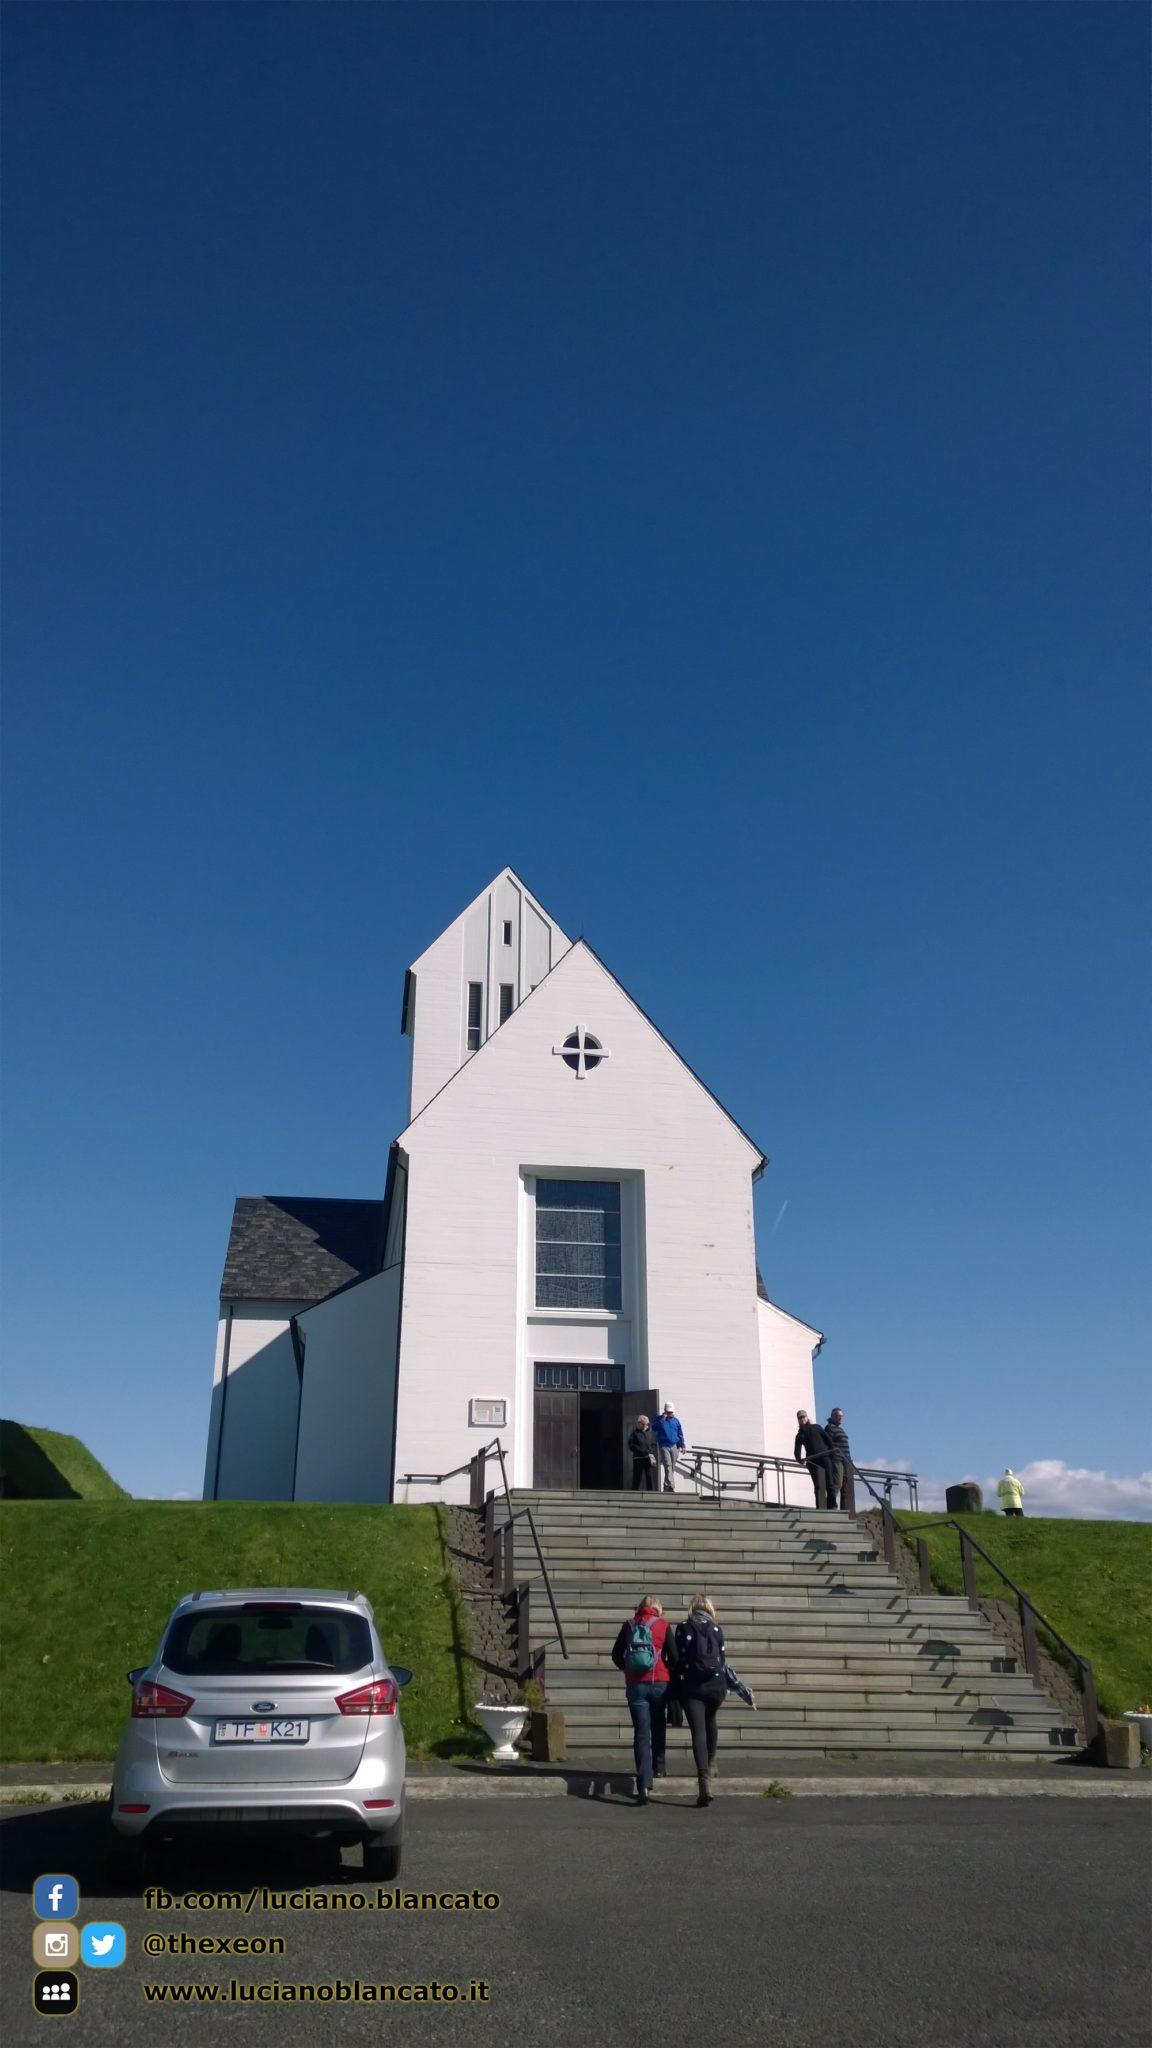 Iceland - paesaggi a nord di Reykjavík - chiesa